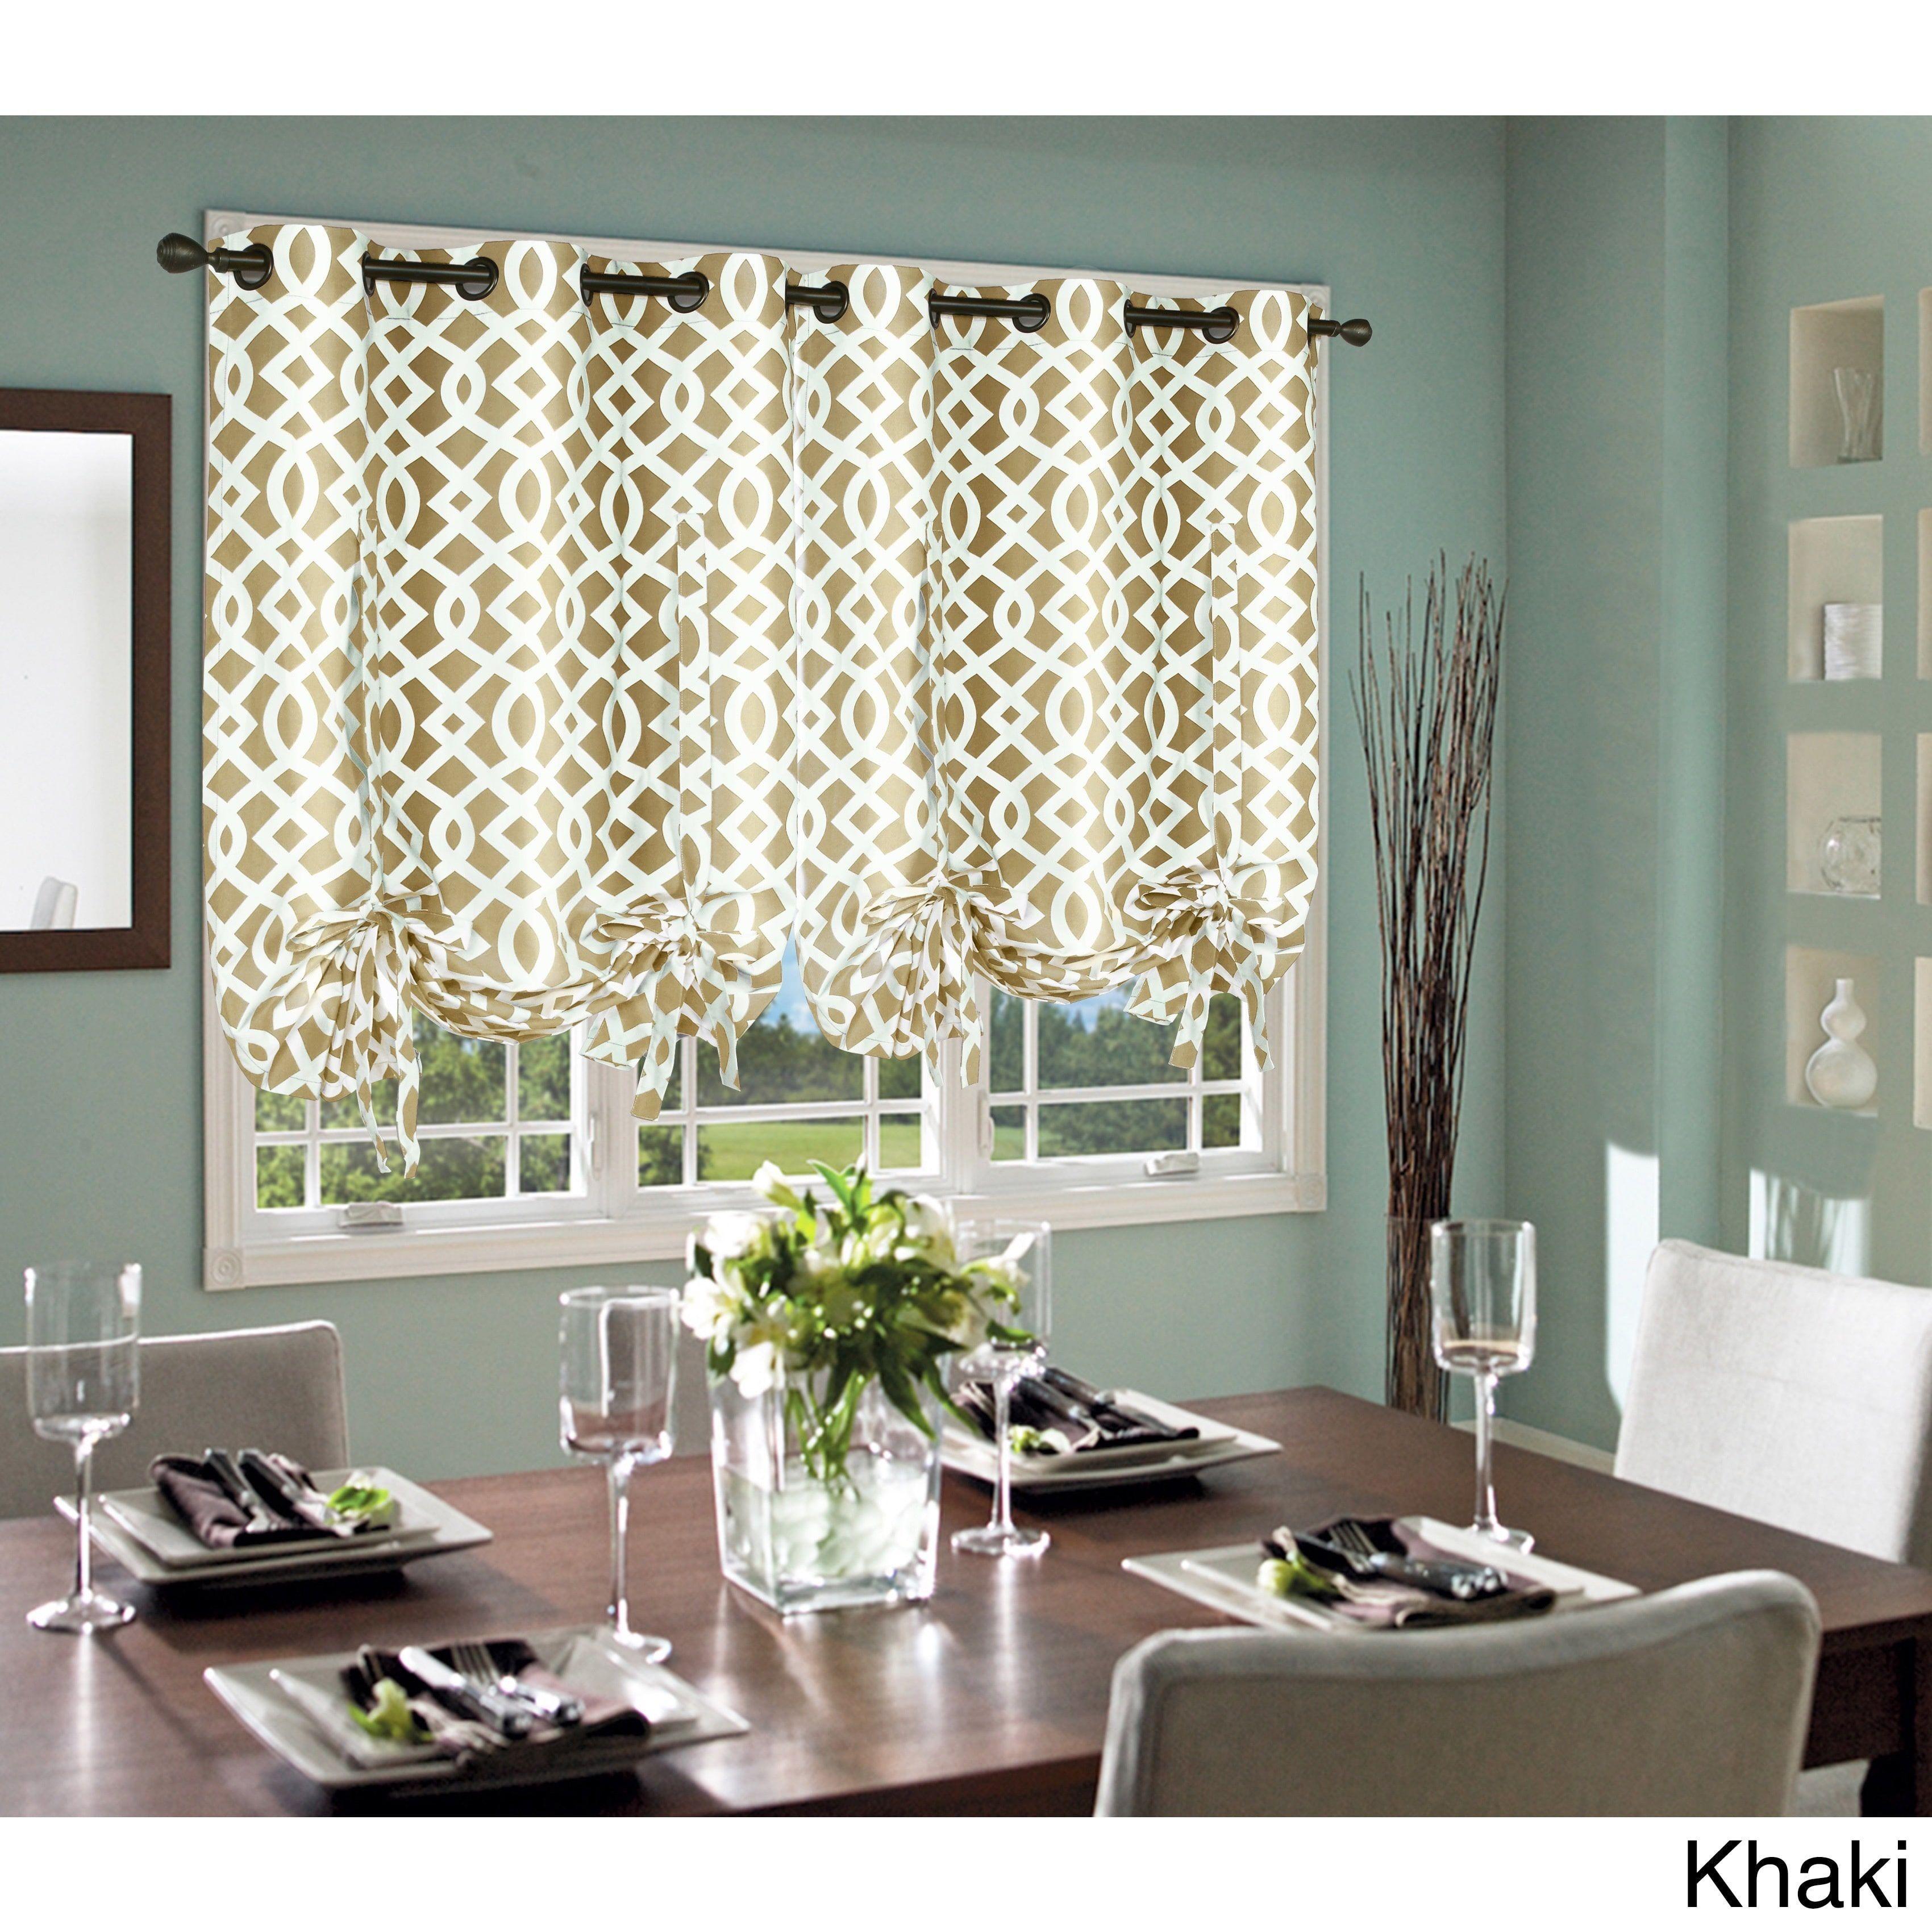 Garden window coverings  trellis thermalogic weathermate lined tieup window shade  new